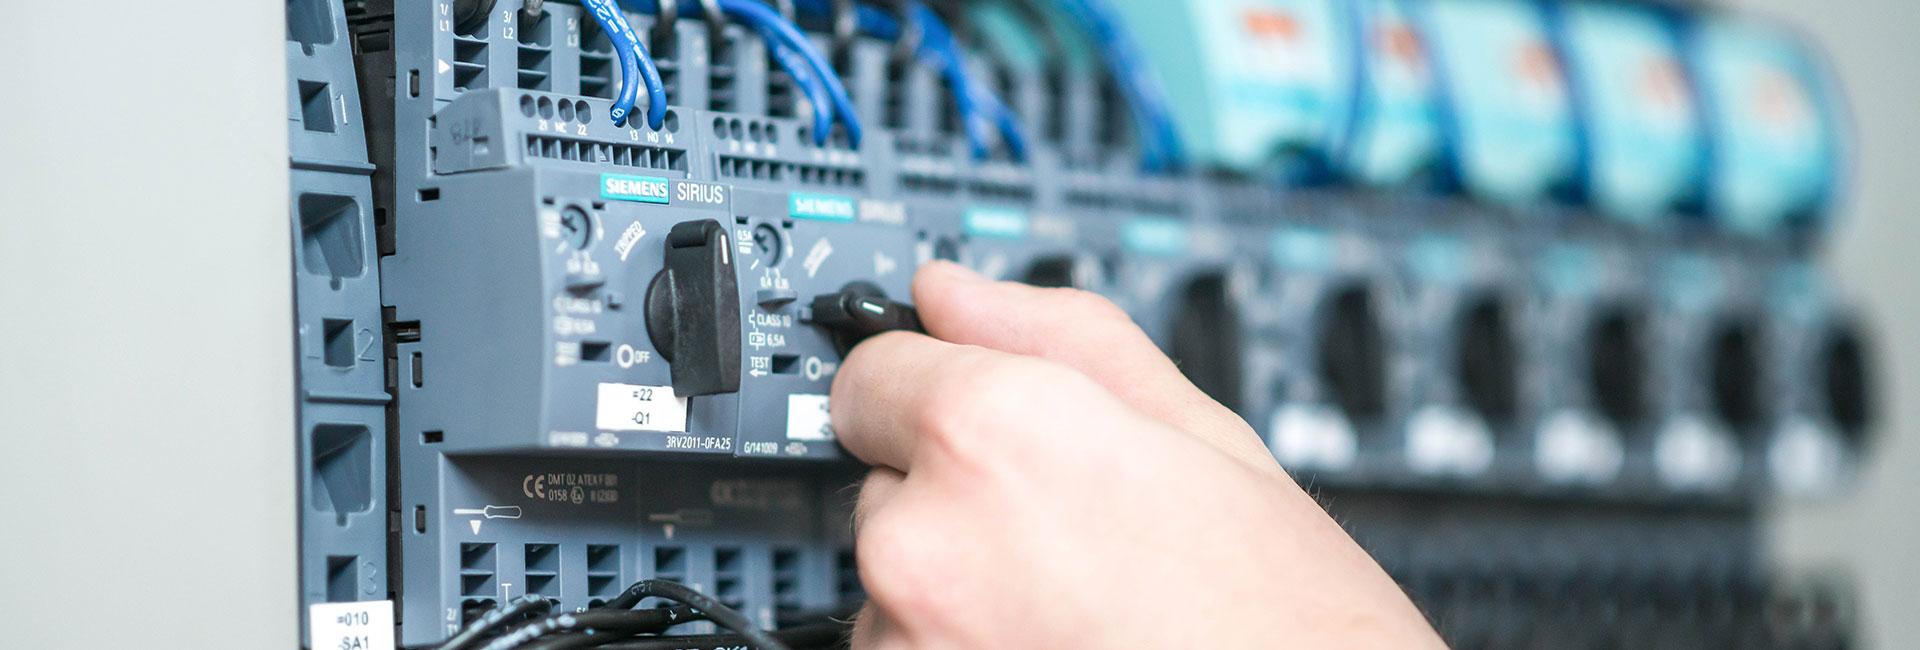 Instandsetzung Elektrotechnik